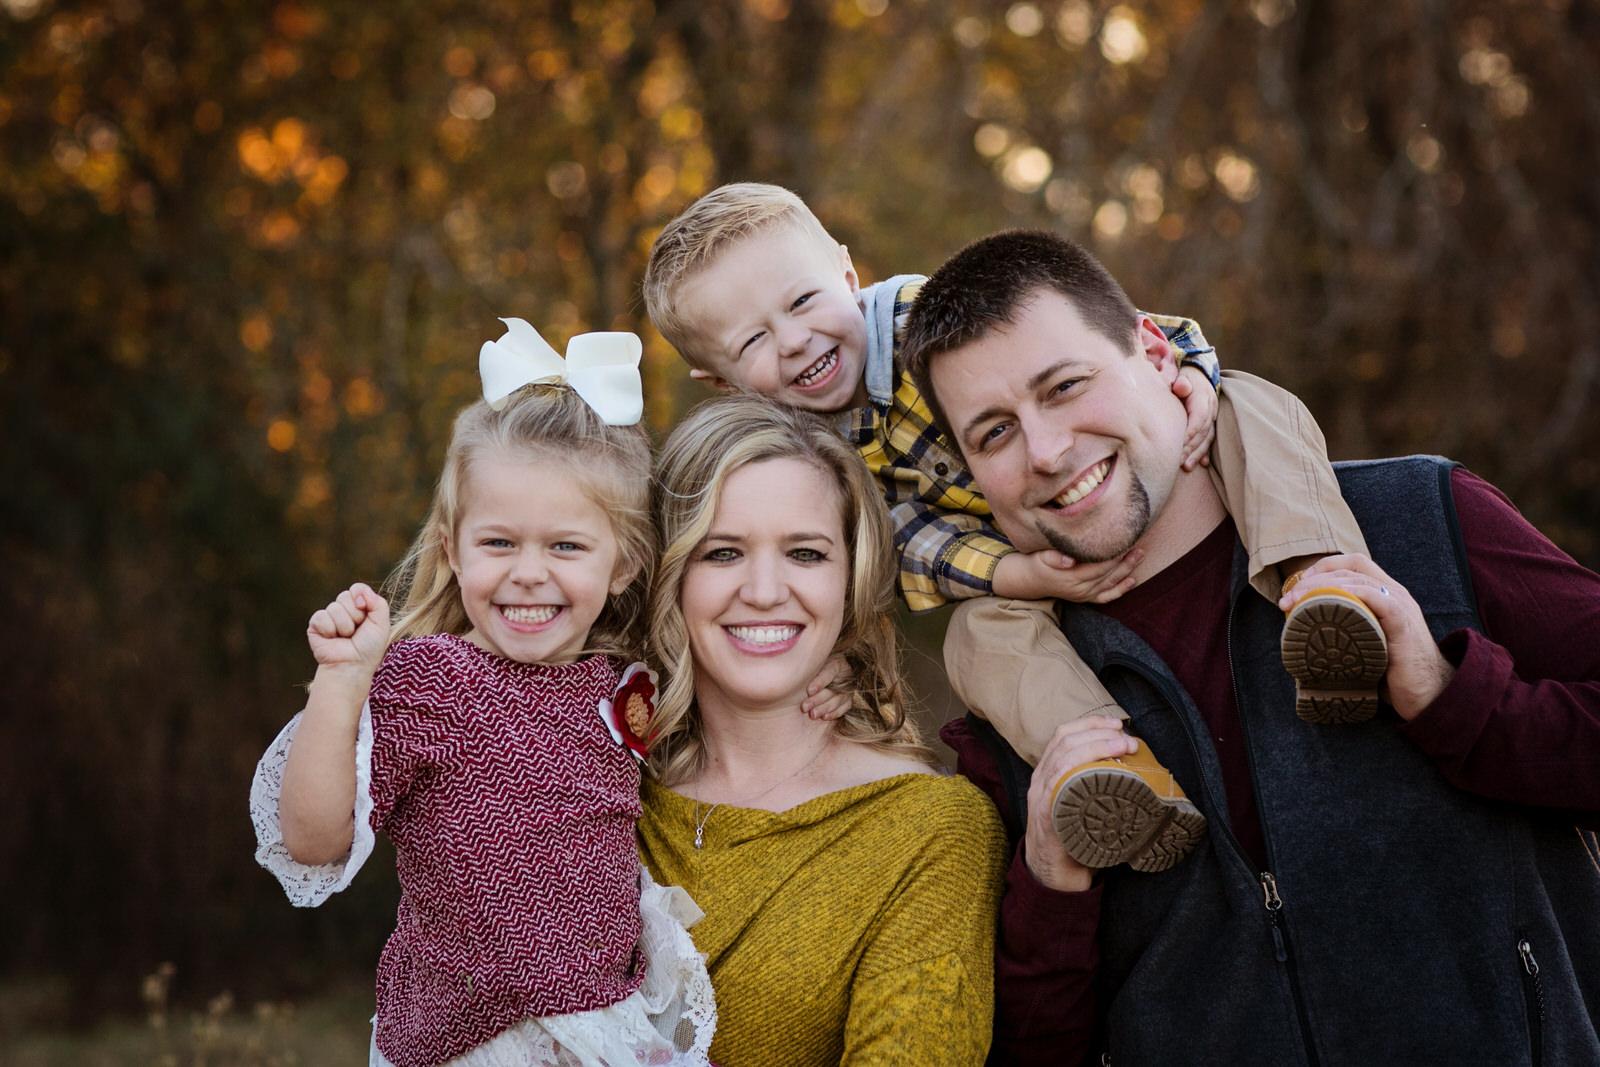 FamilySessions - Family, Children, Etc.Starting at $200